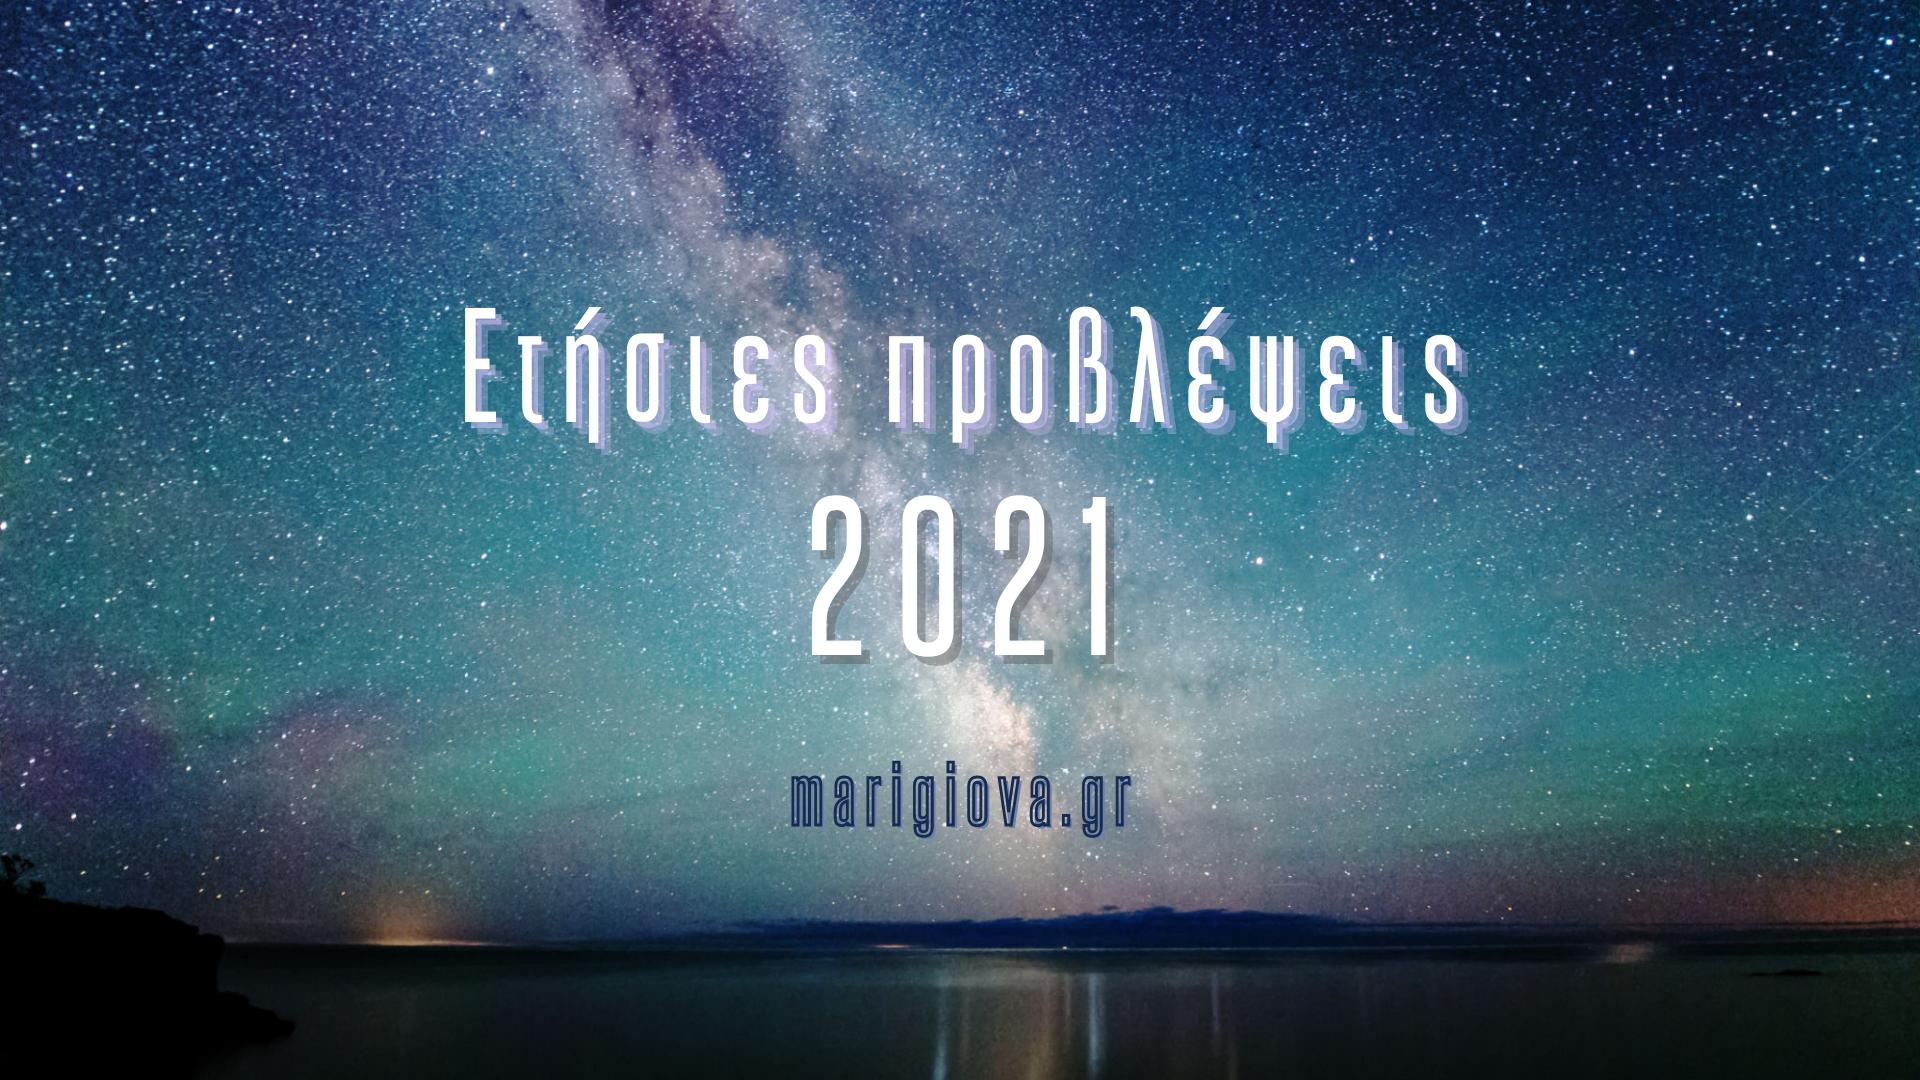 https://marigiova.gr/wp-content/uploads/2020/12/Μάρι-Γιόβα-Ετήσιες-προβλέψεις-2021.png